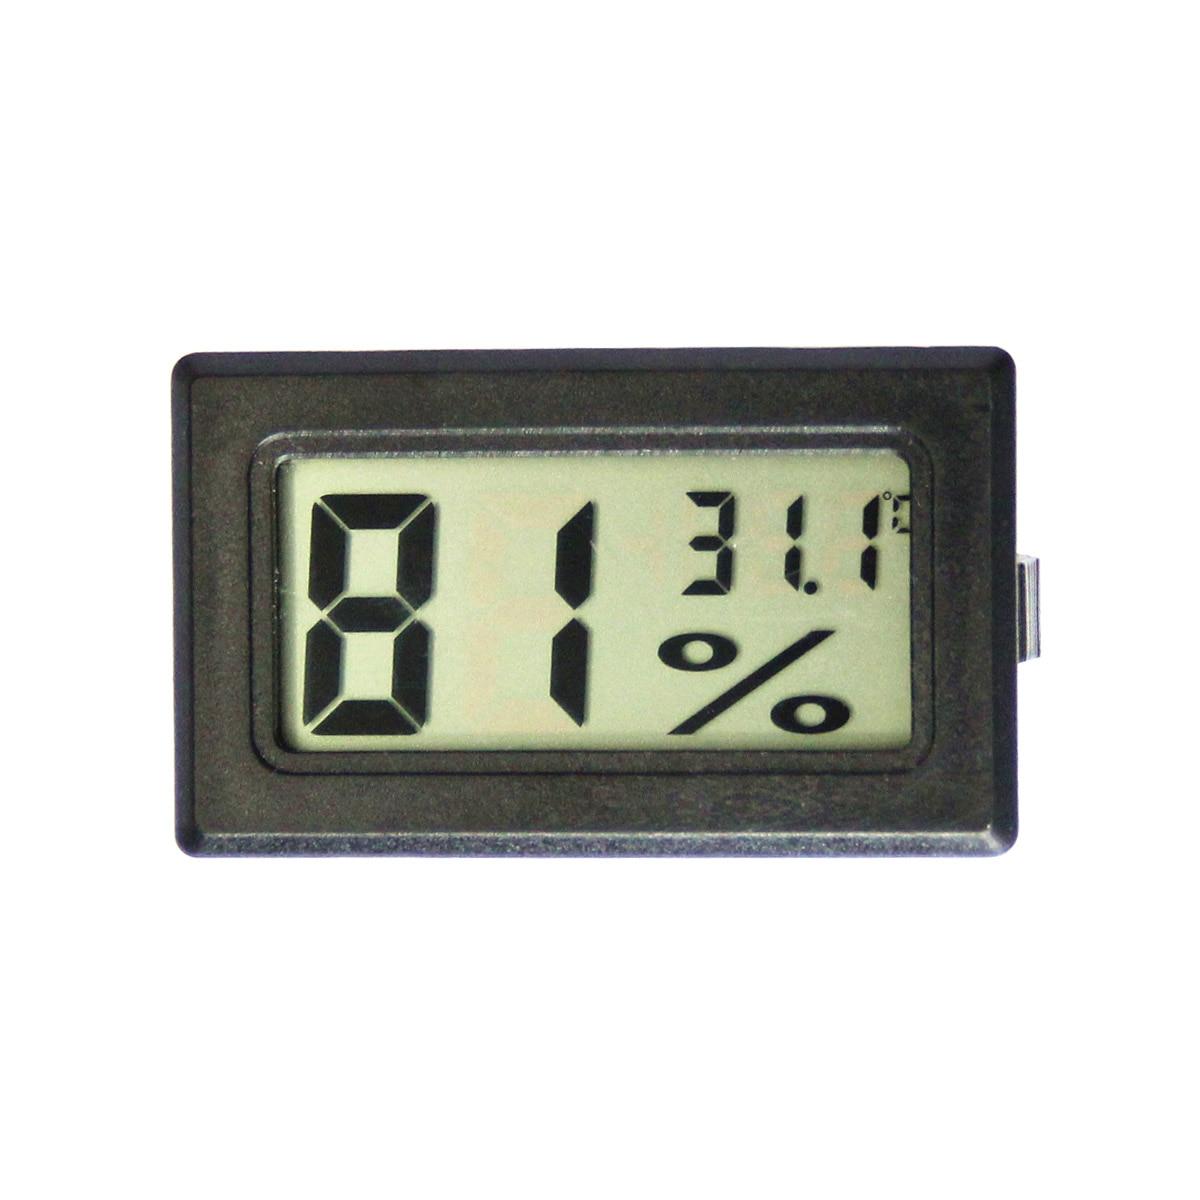 MOSEKO Hot Sale Mini Digitální LCD Indoor Pohodlný teplotní senzor Vlhkoměr Teploměr Hygrometer Gauge